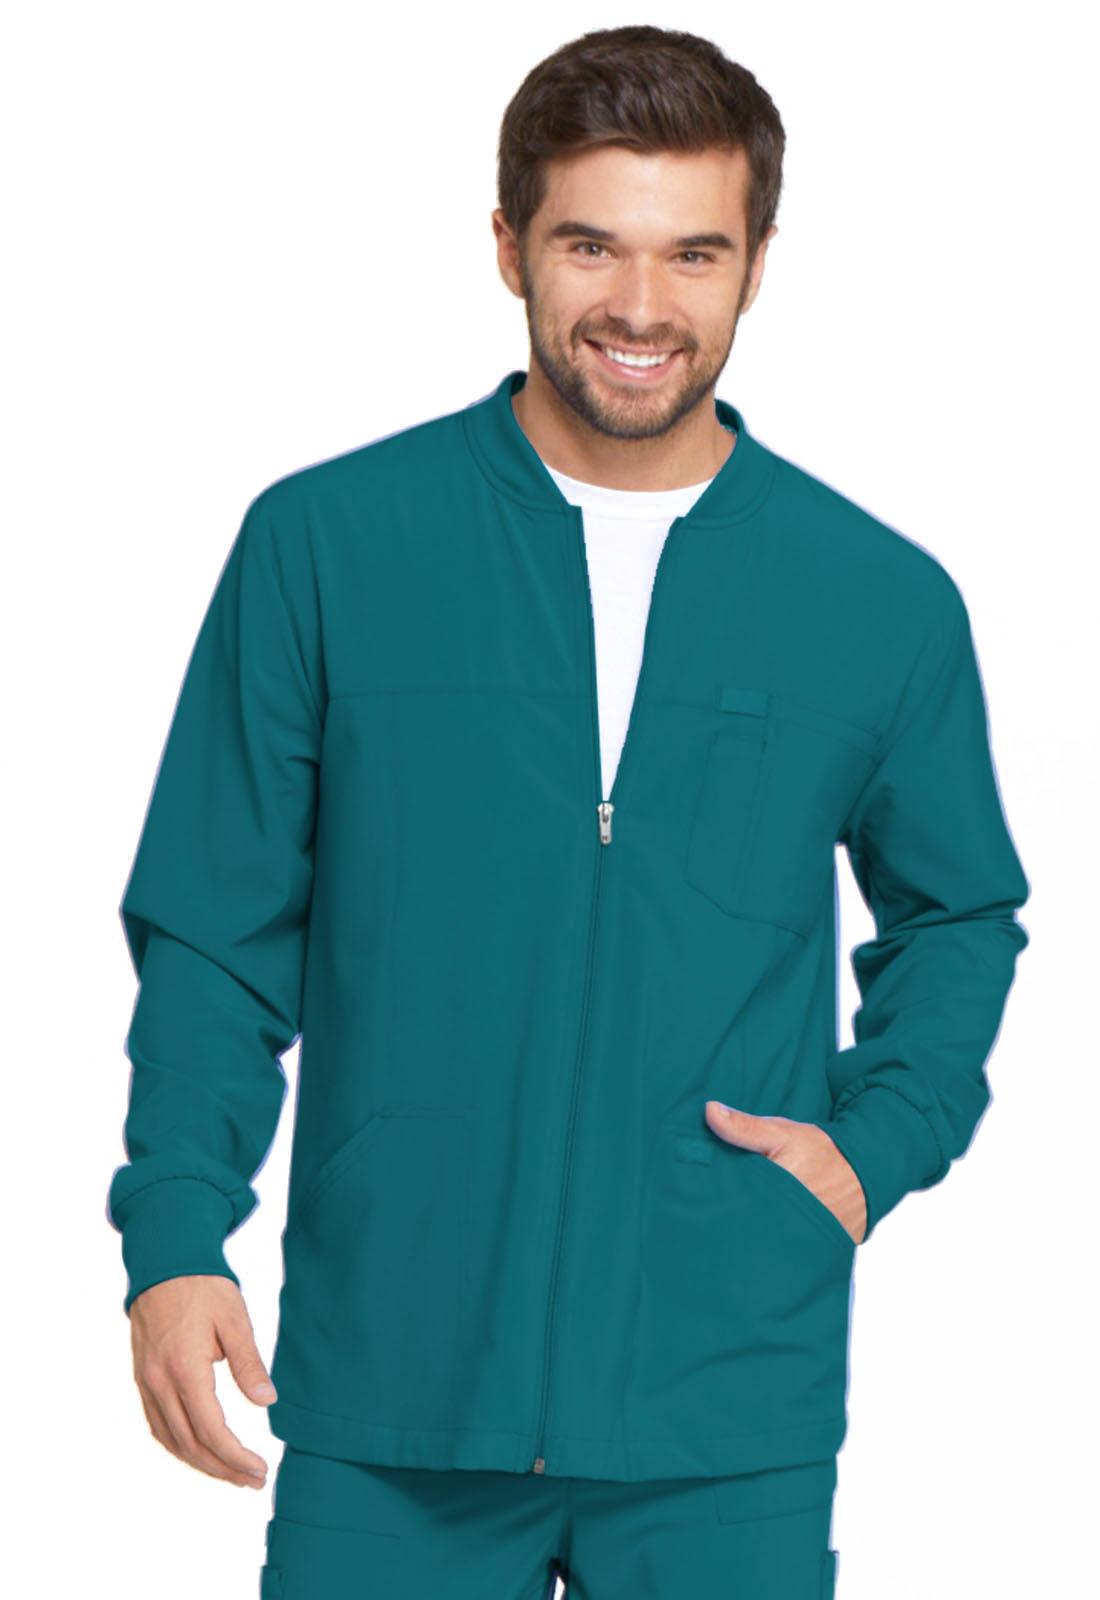 eb1c2cc72e5 EDS Essentials Men's Zip Front Warm-Up Jacket in Caribbean Blue ...